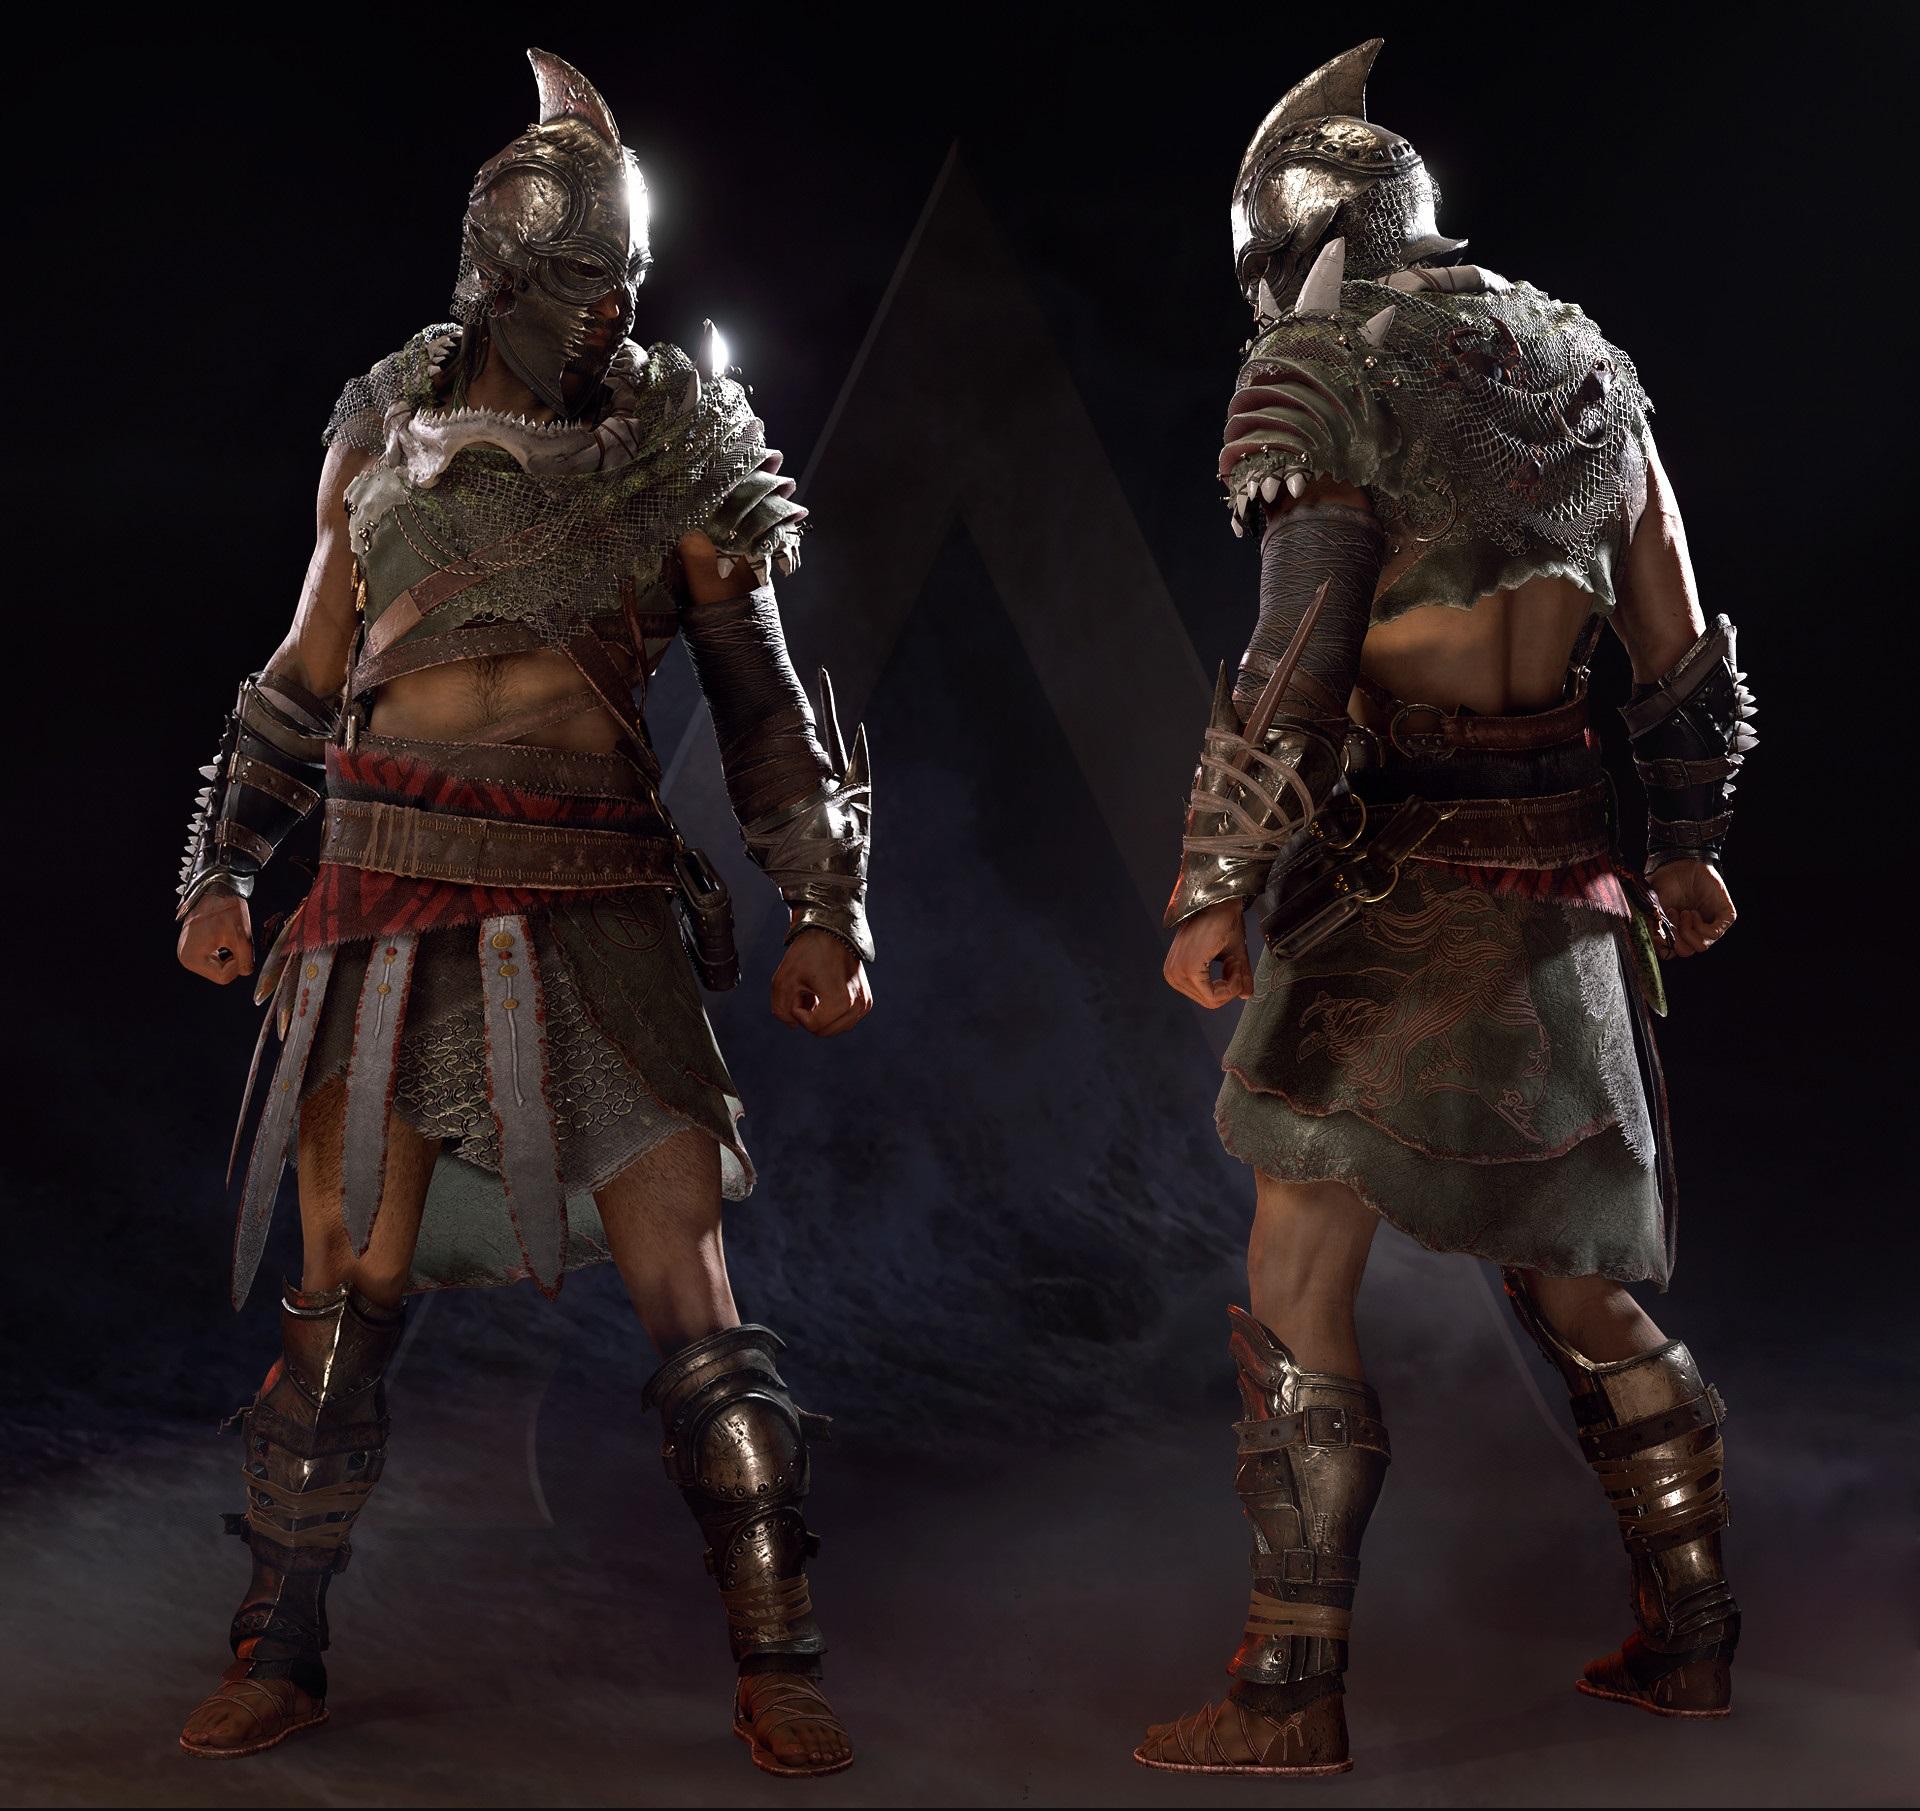 assassins creed odyssey assassins armor - HD1920×1811